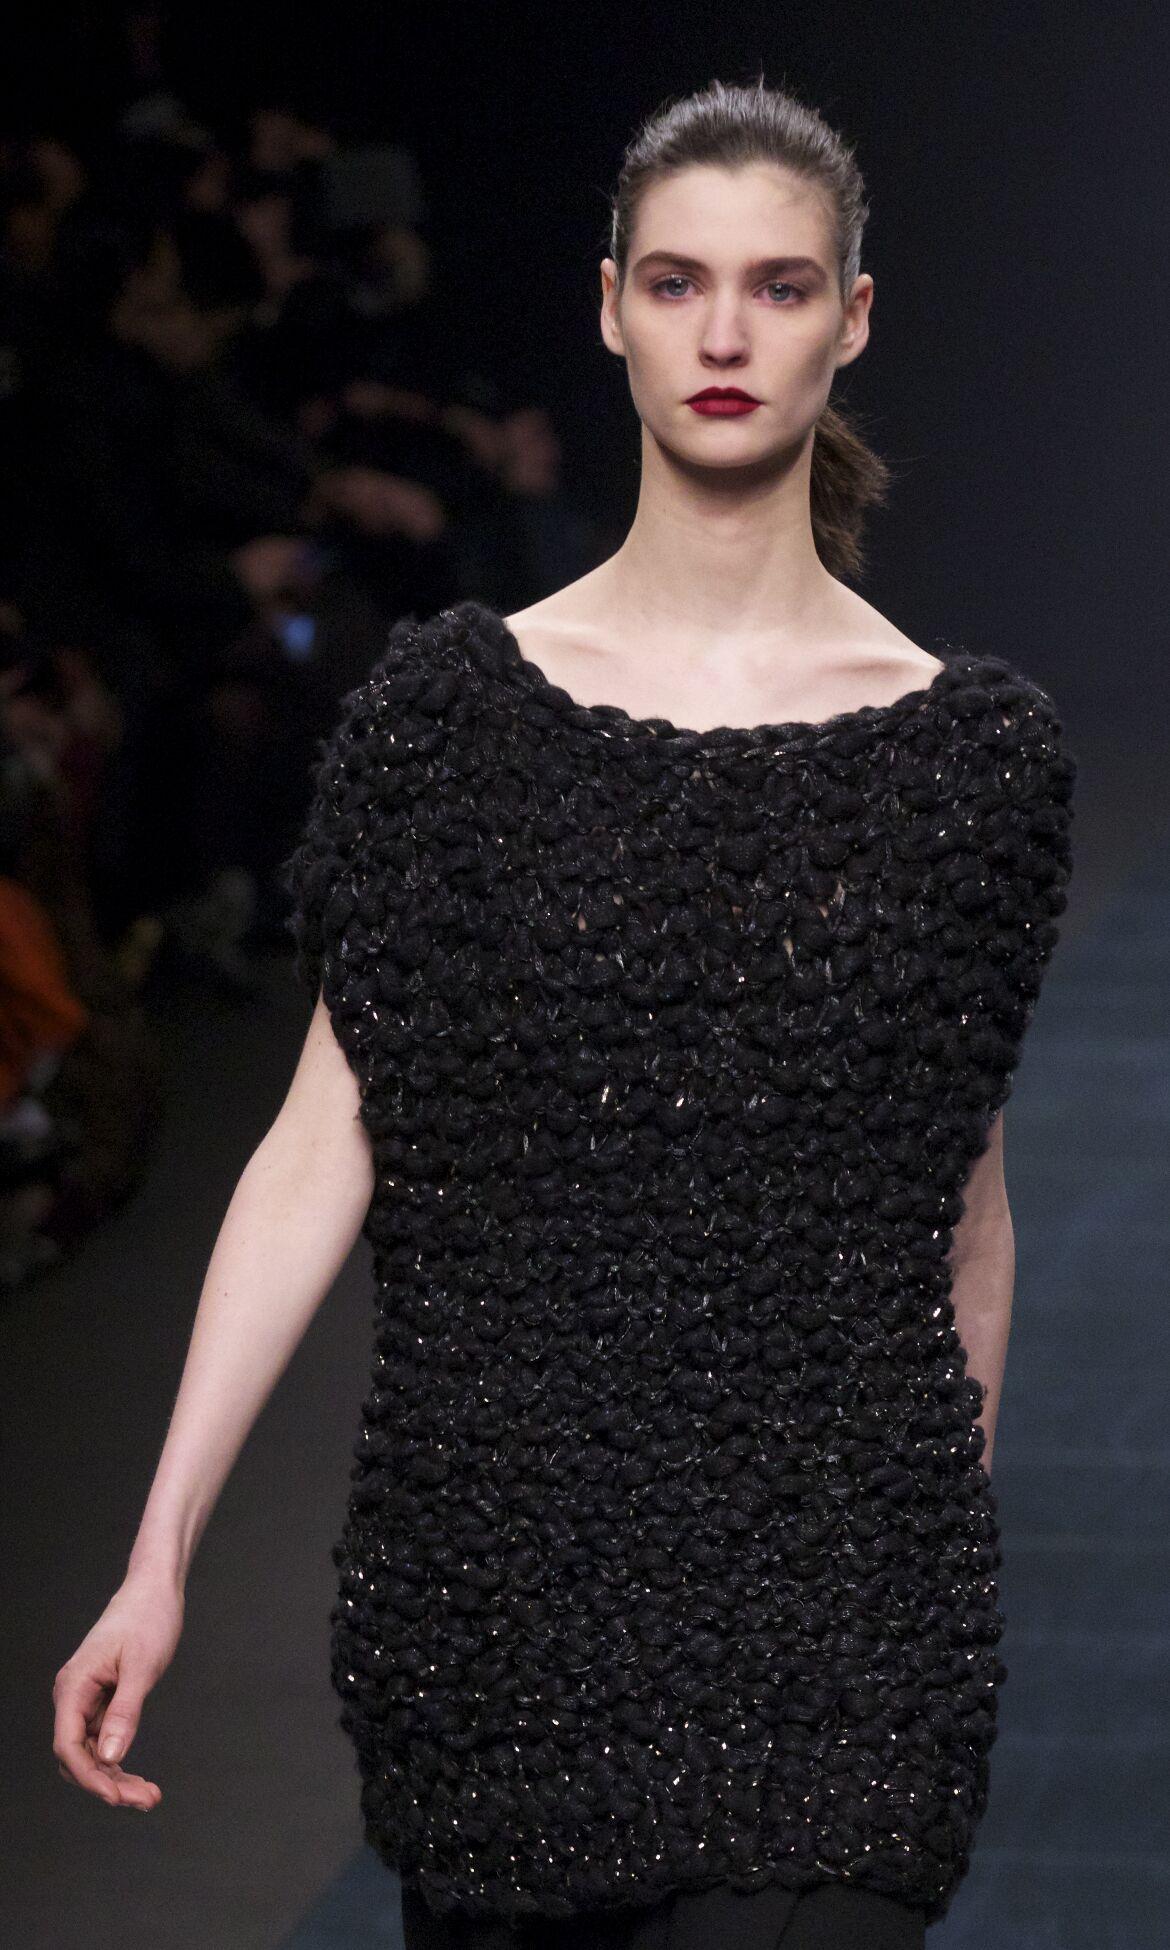 Anteprima Fashion Trends